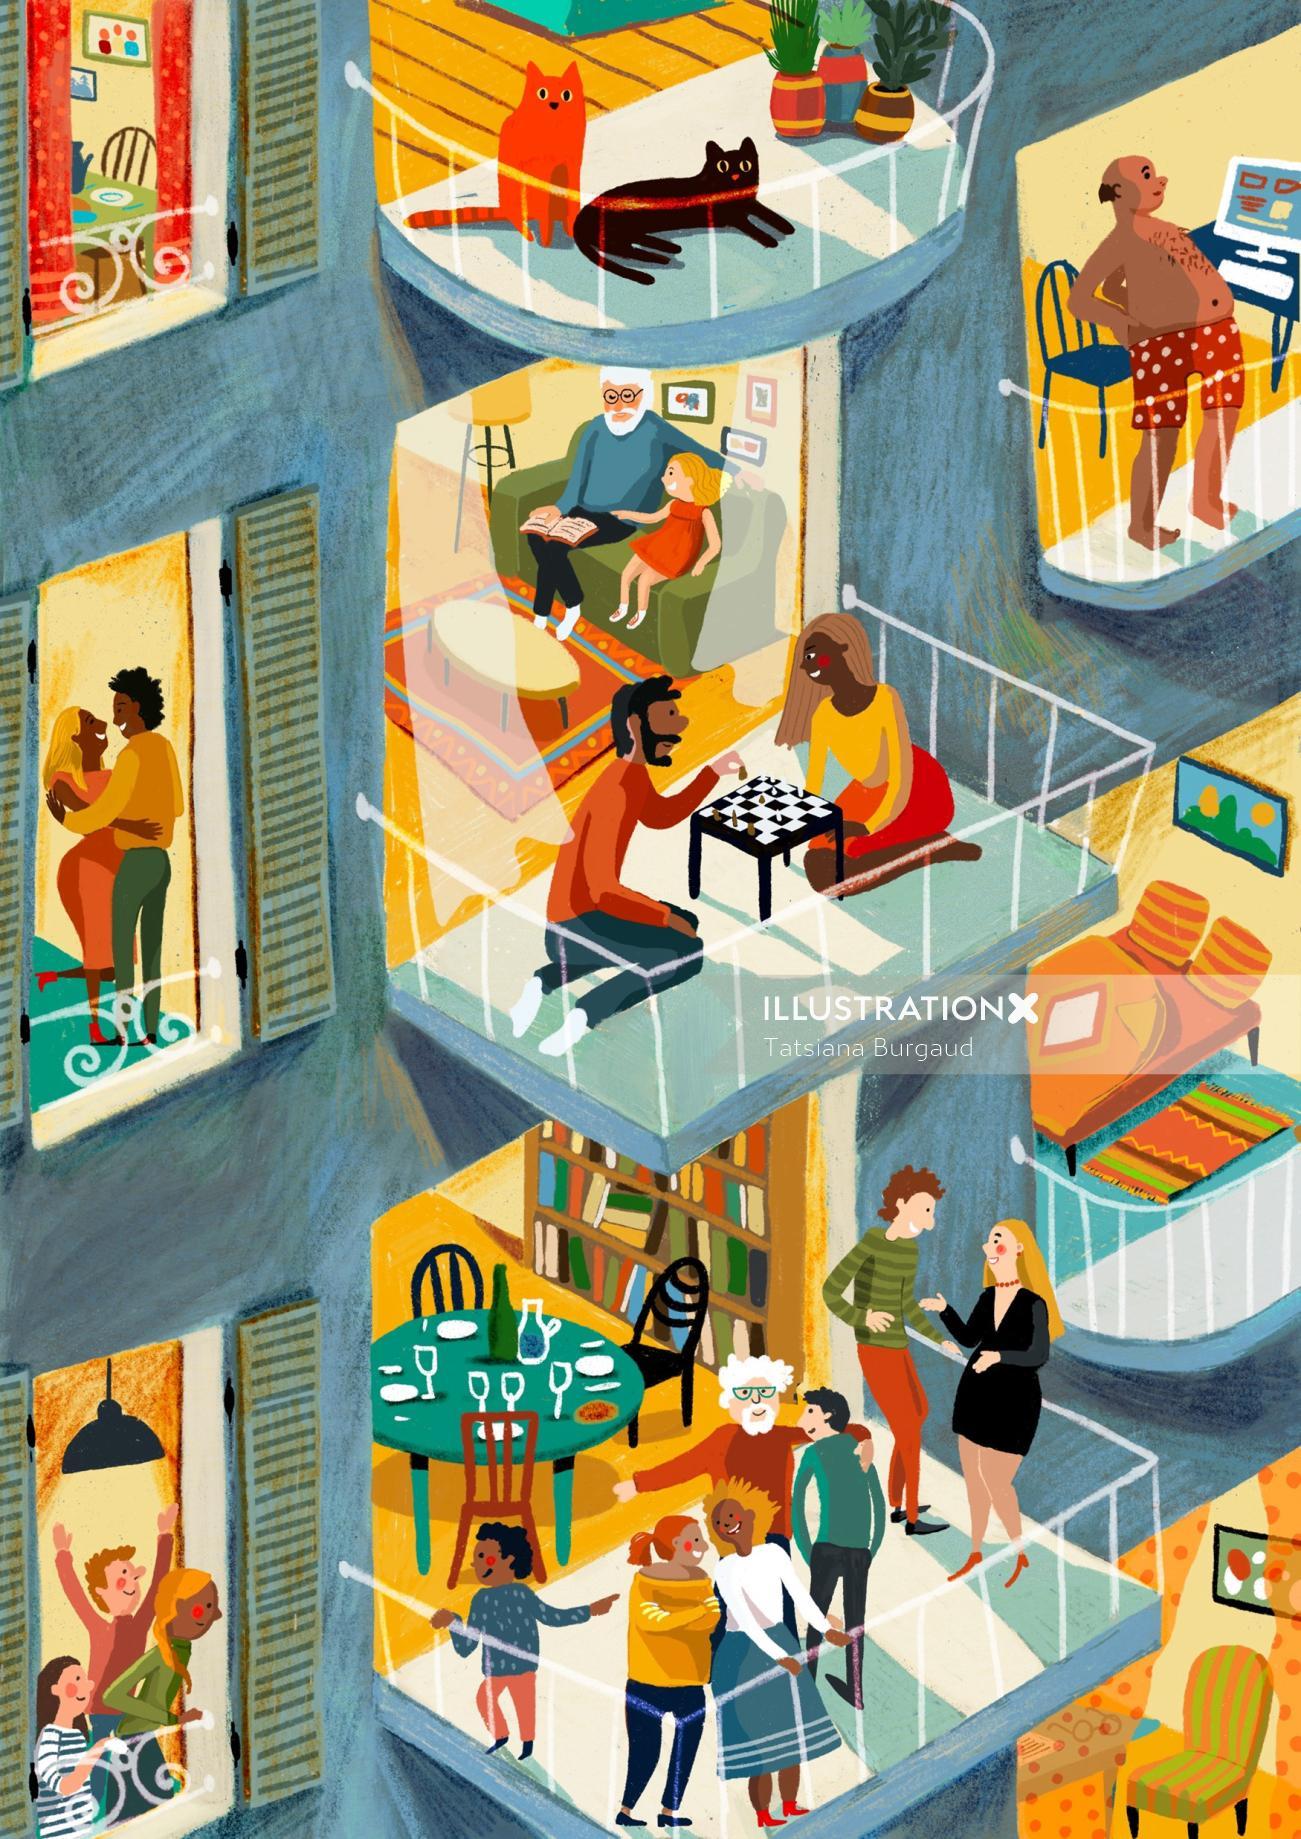 flat, apartment, house, family, children, interior